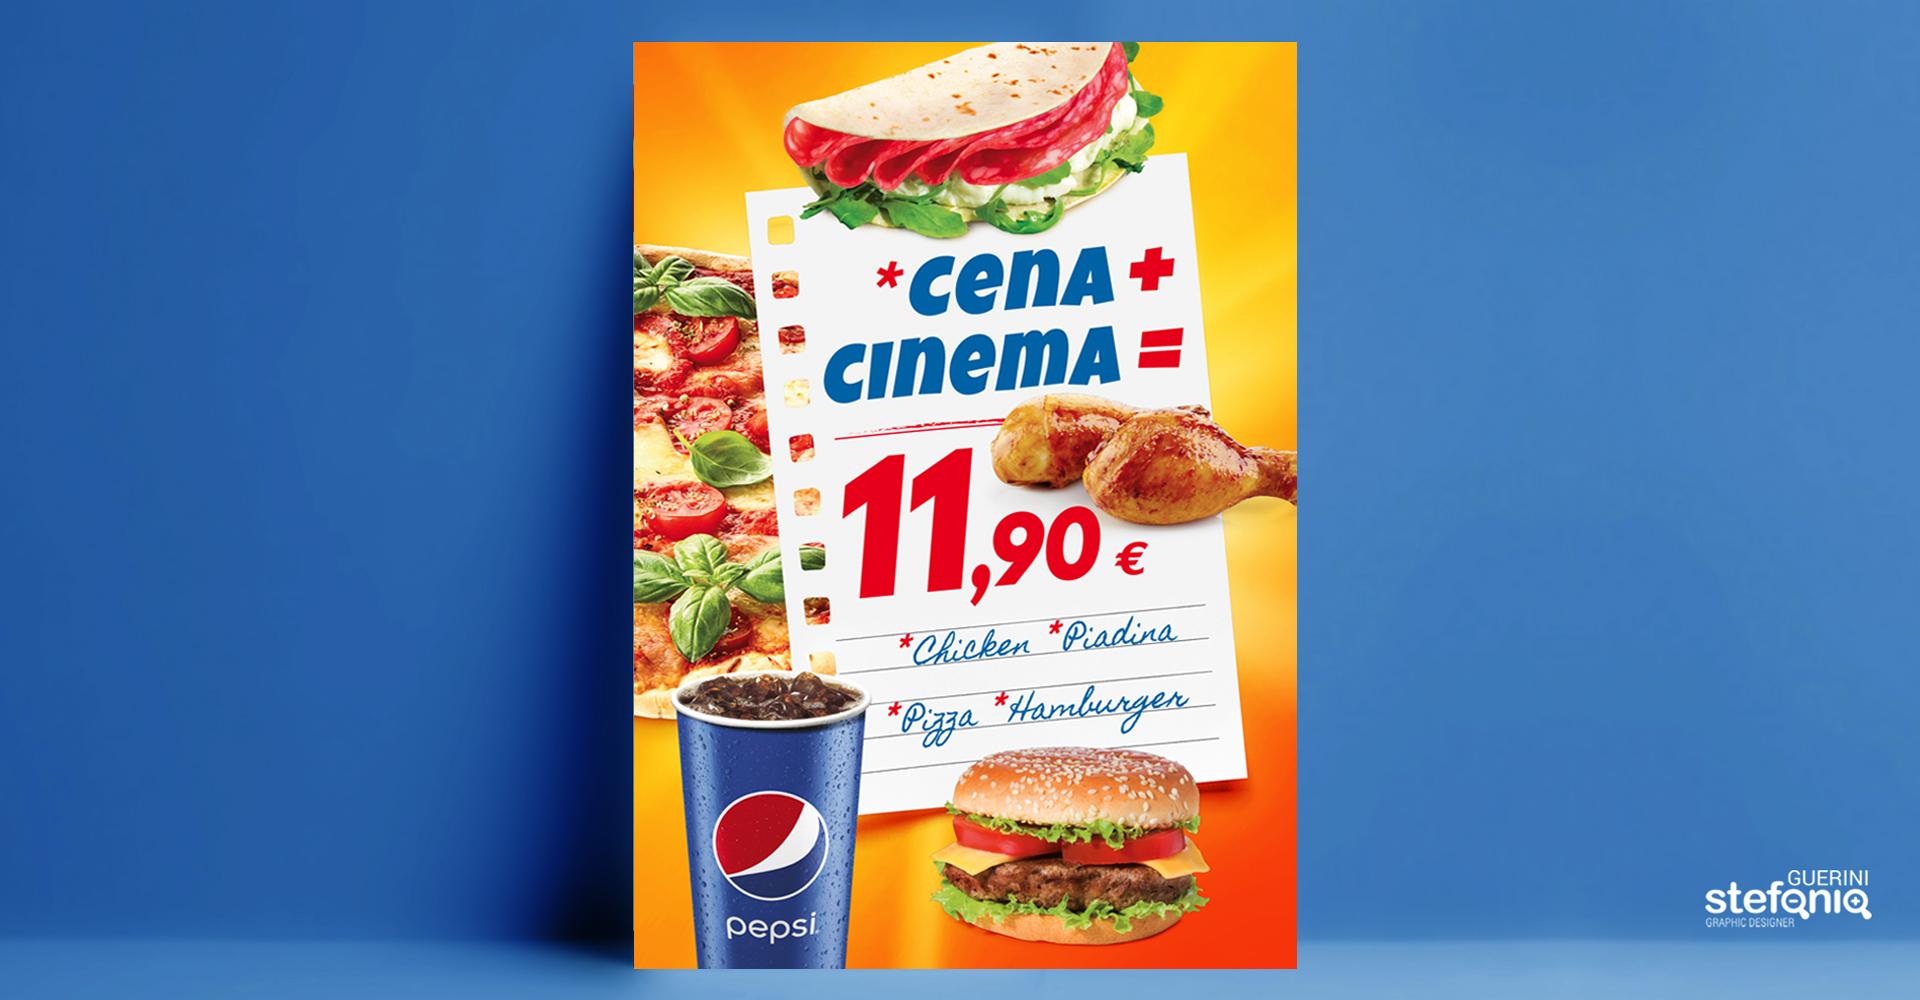 CINELANDIA_combo stefania-guerini-graphic-designer-immagine-coordinata-logo-locandine-flyer-stampa cantu como